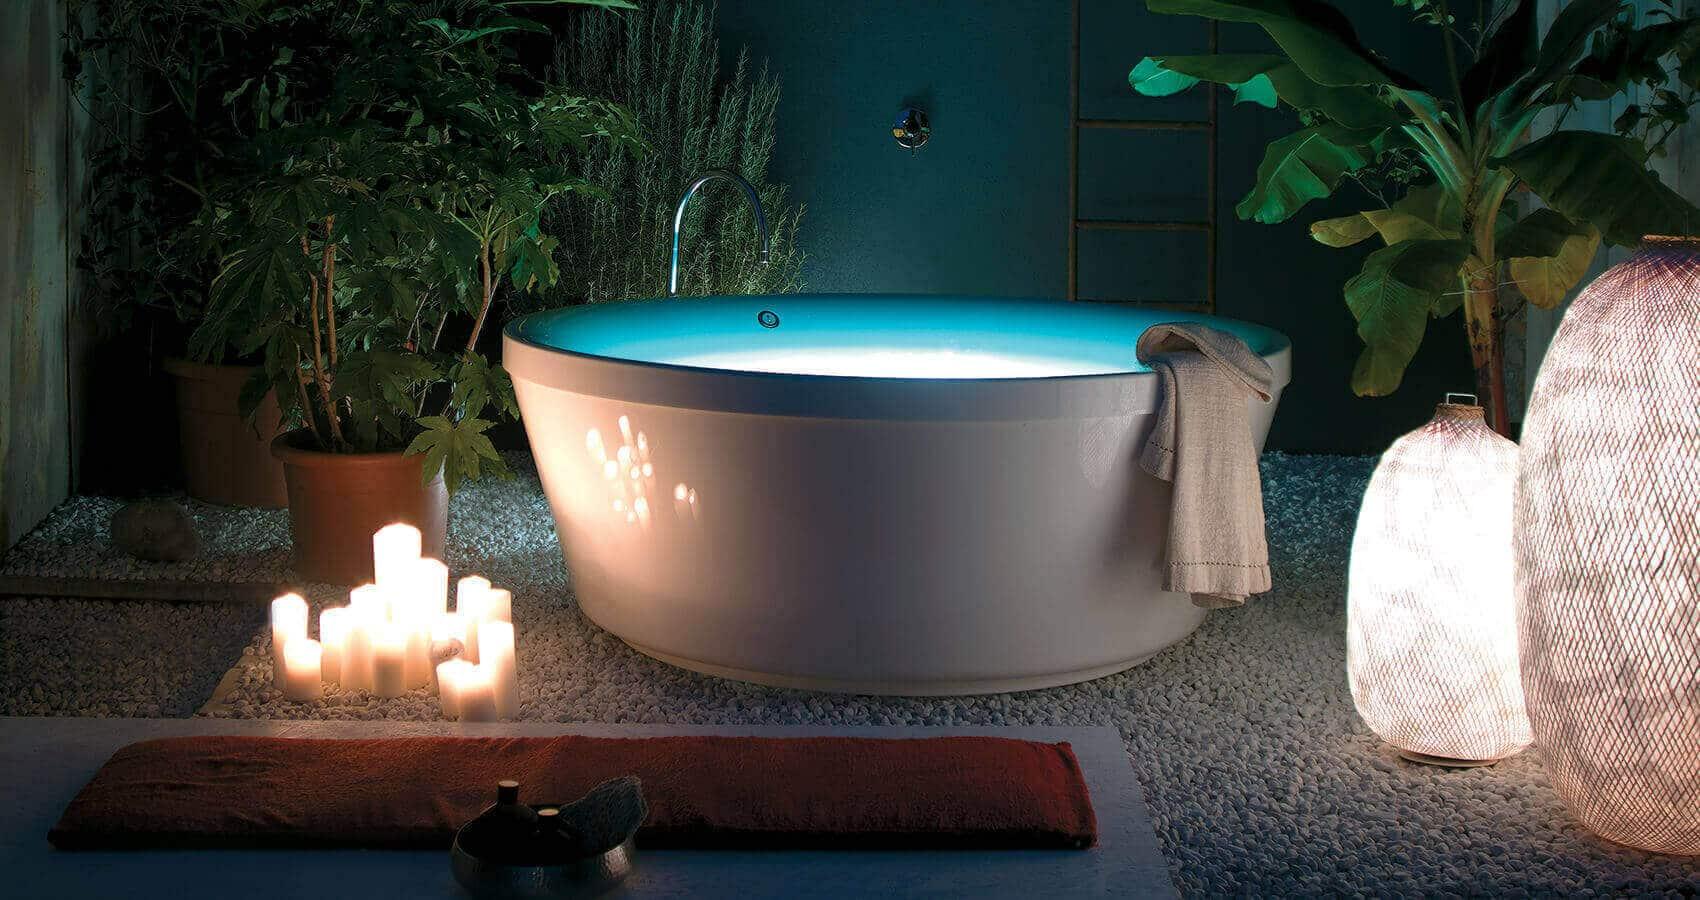 zucchetti-kos-bath-tubs-geo-collection